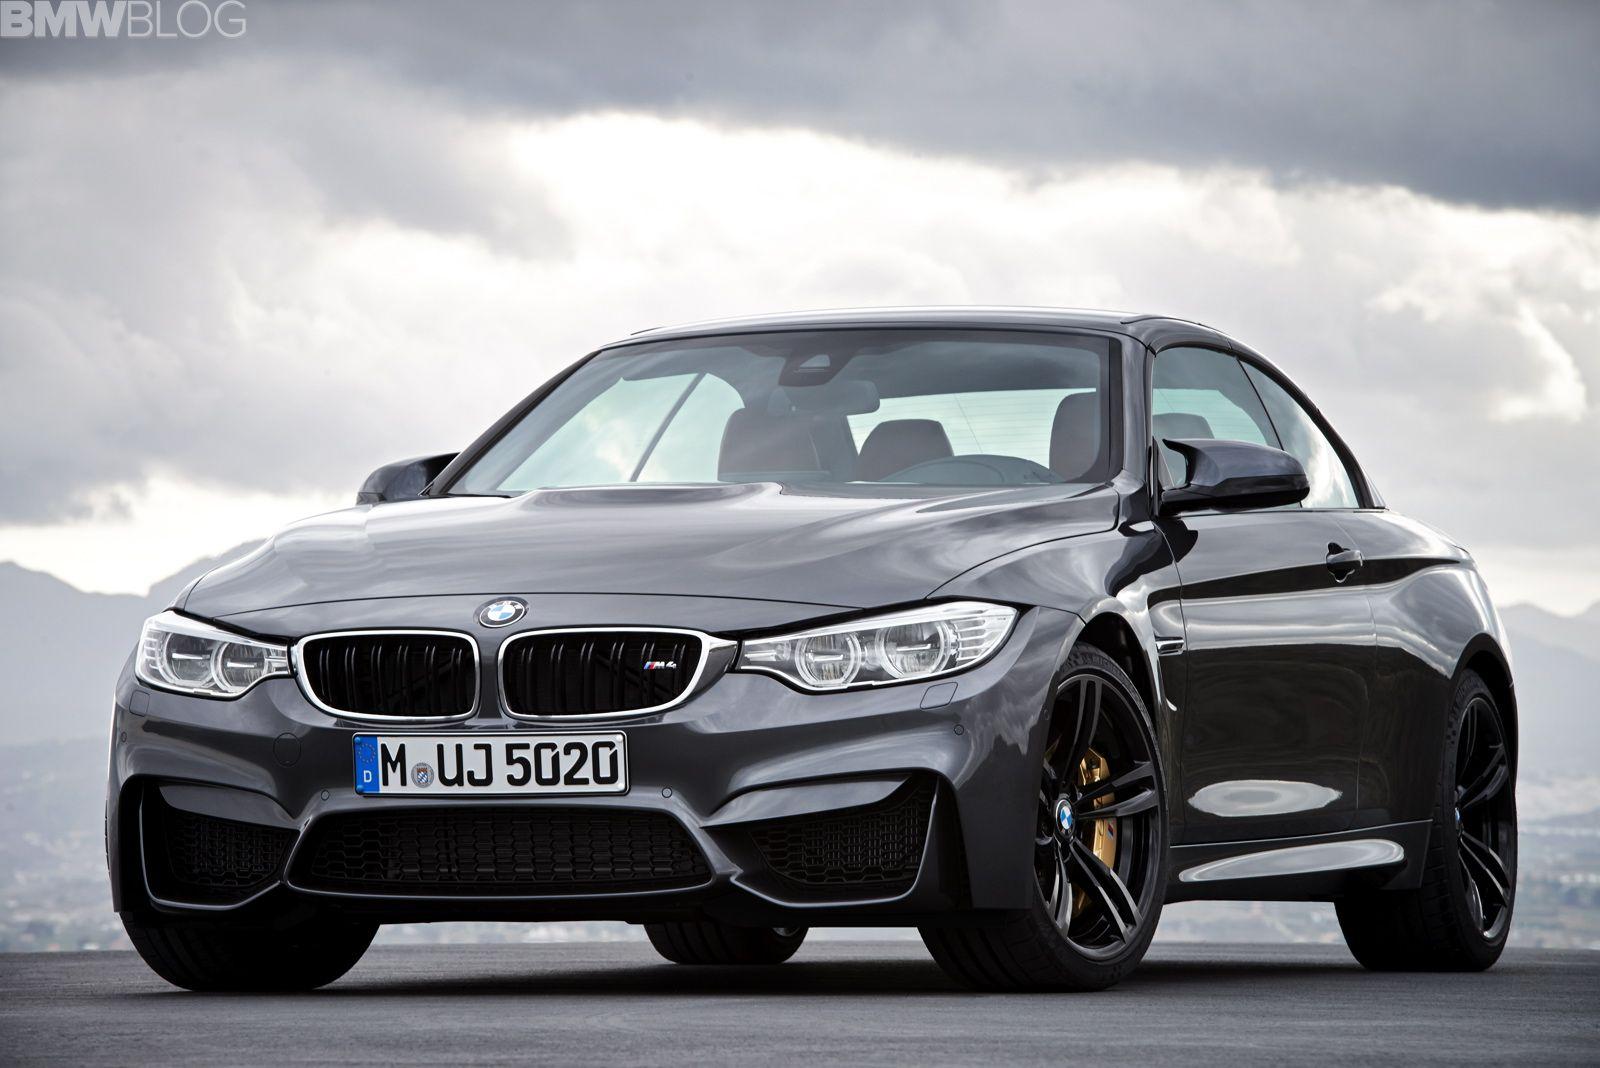 BMW Convertible bmw beamer cost Beamer   cars   Pinterest   2015 bmw m4, BMW and Bmw m4